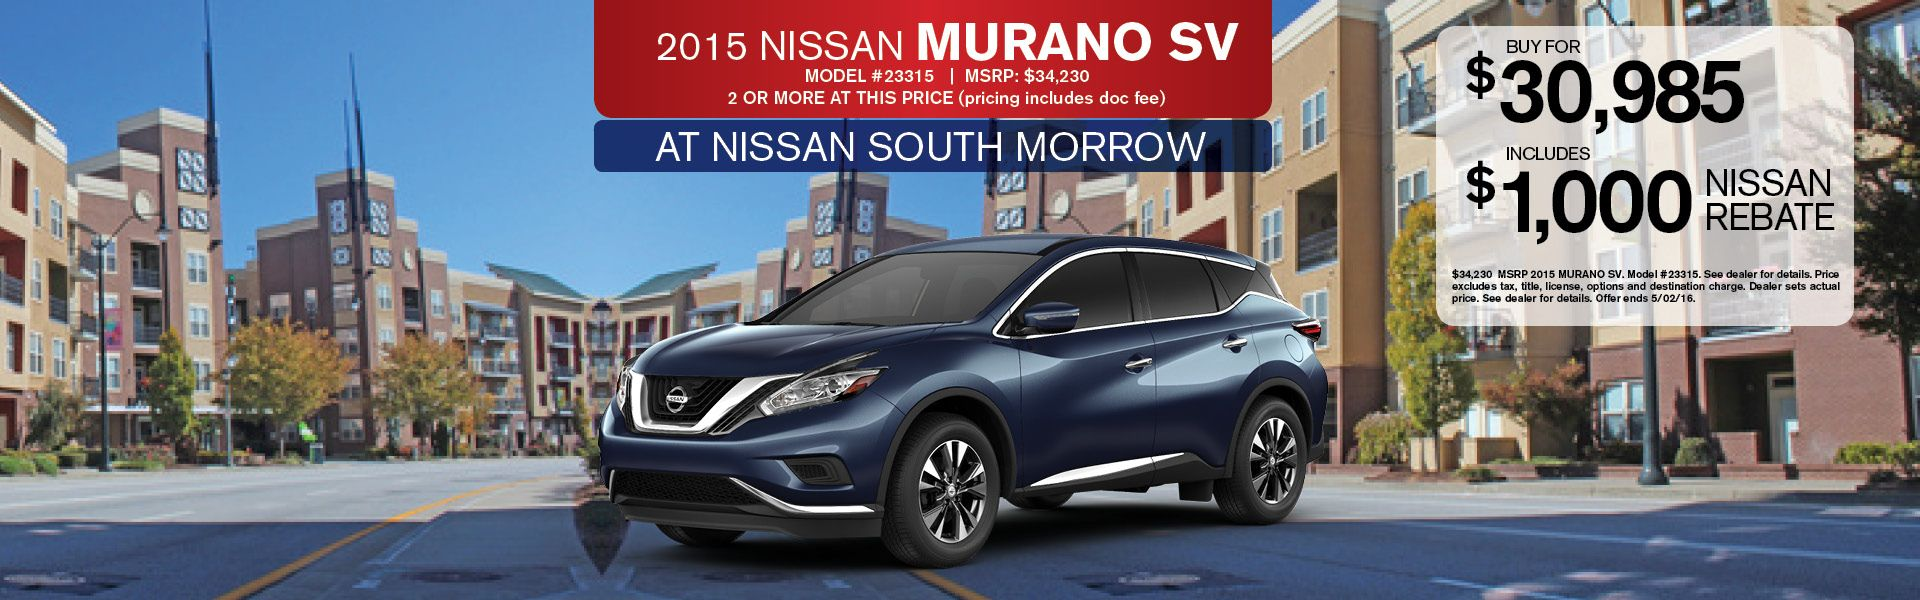 Used Car Dealerships In Atlanta Ga >> Nissan South Morrow New And Used Car Dealership Near